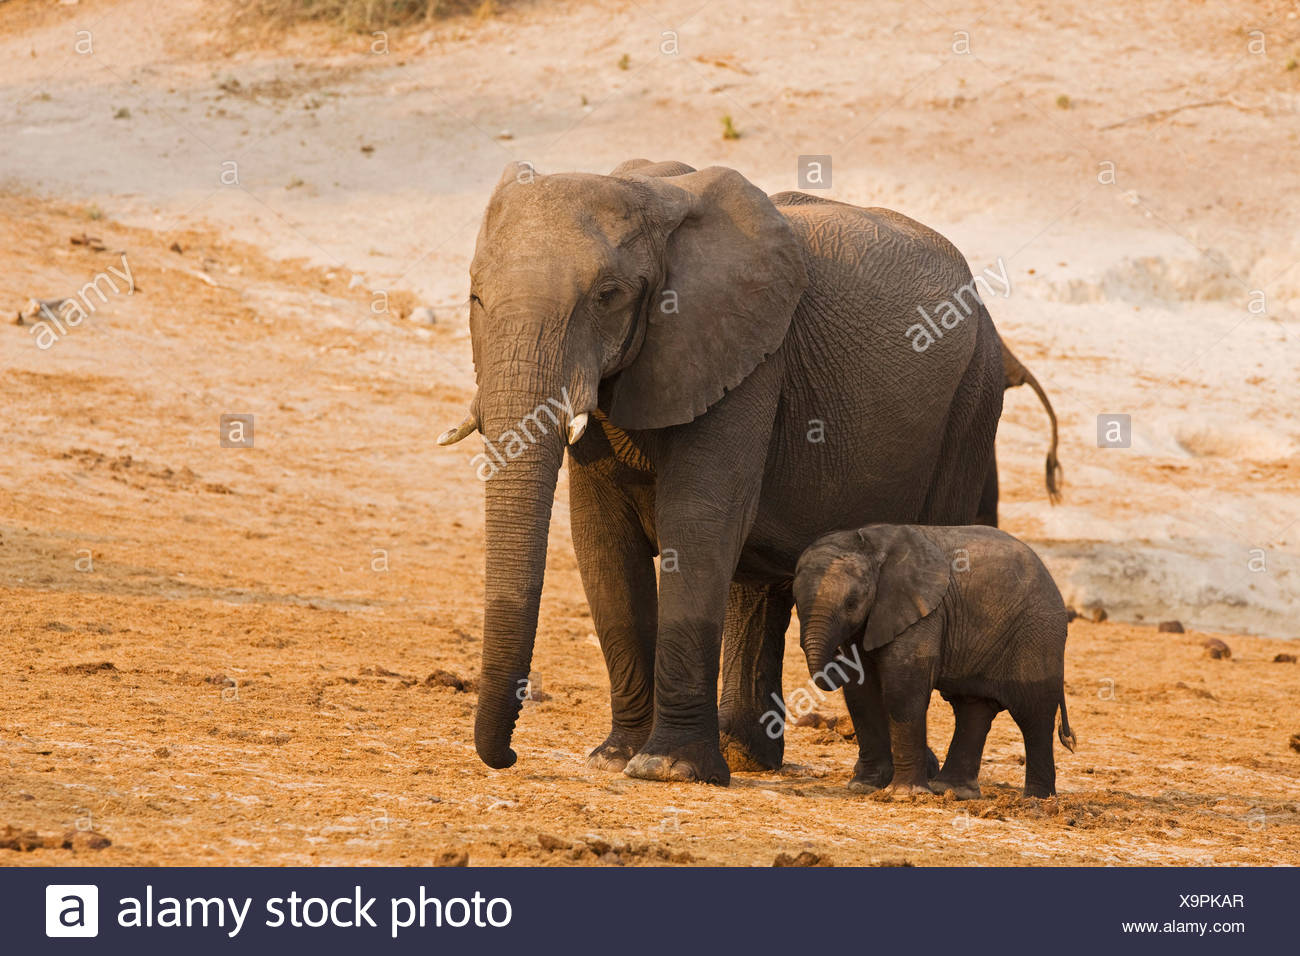 Africa, Botswana, African Elephant (Loxodonta africana) mother and calf Stock Photo